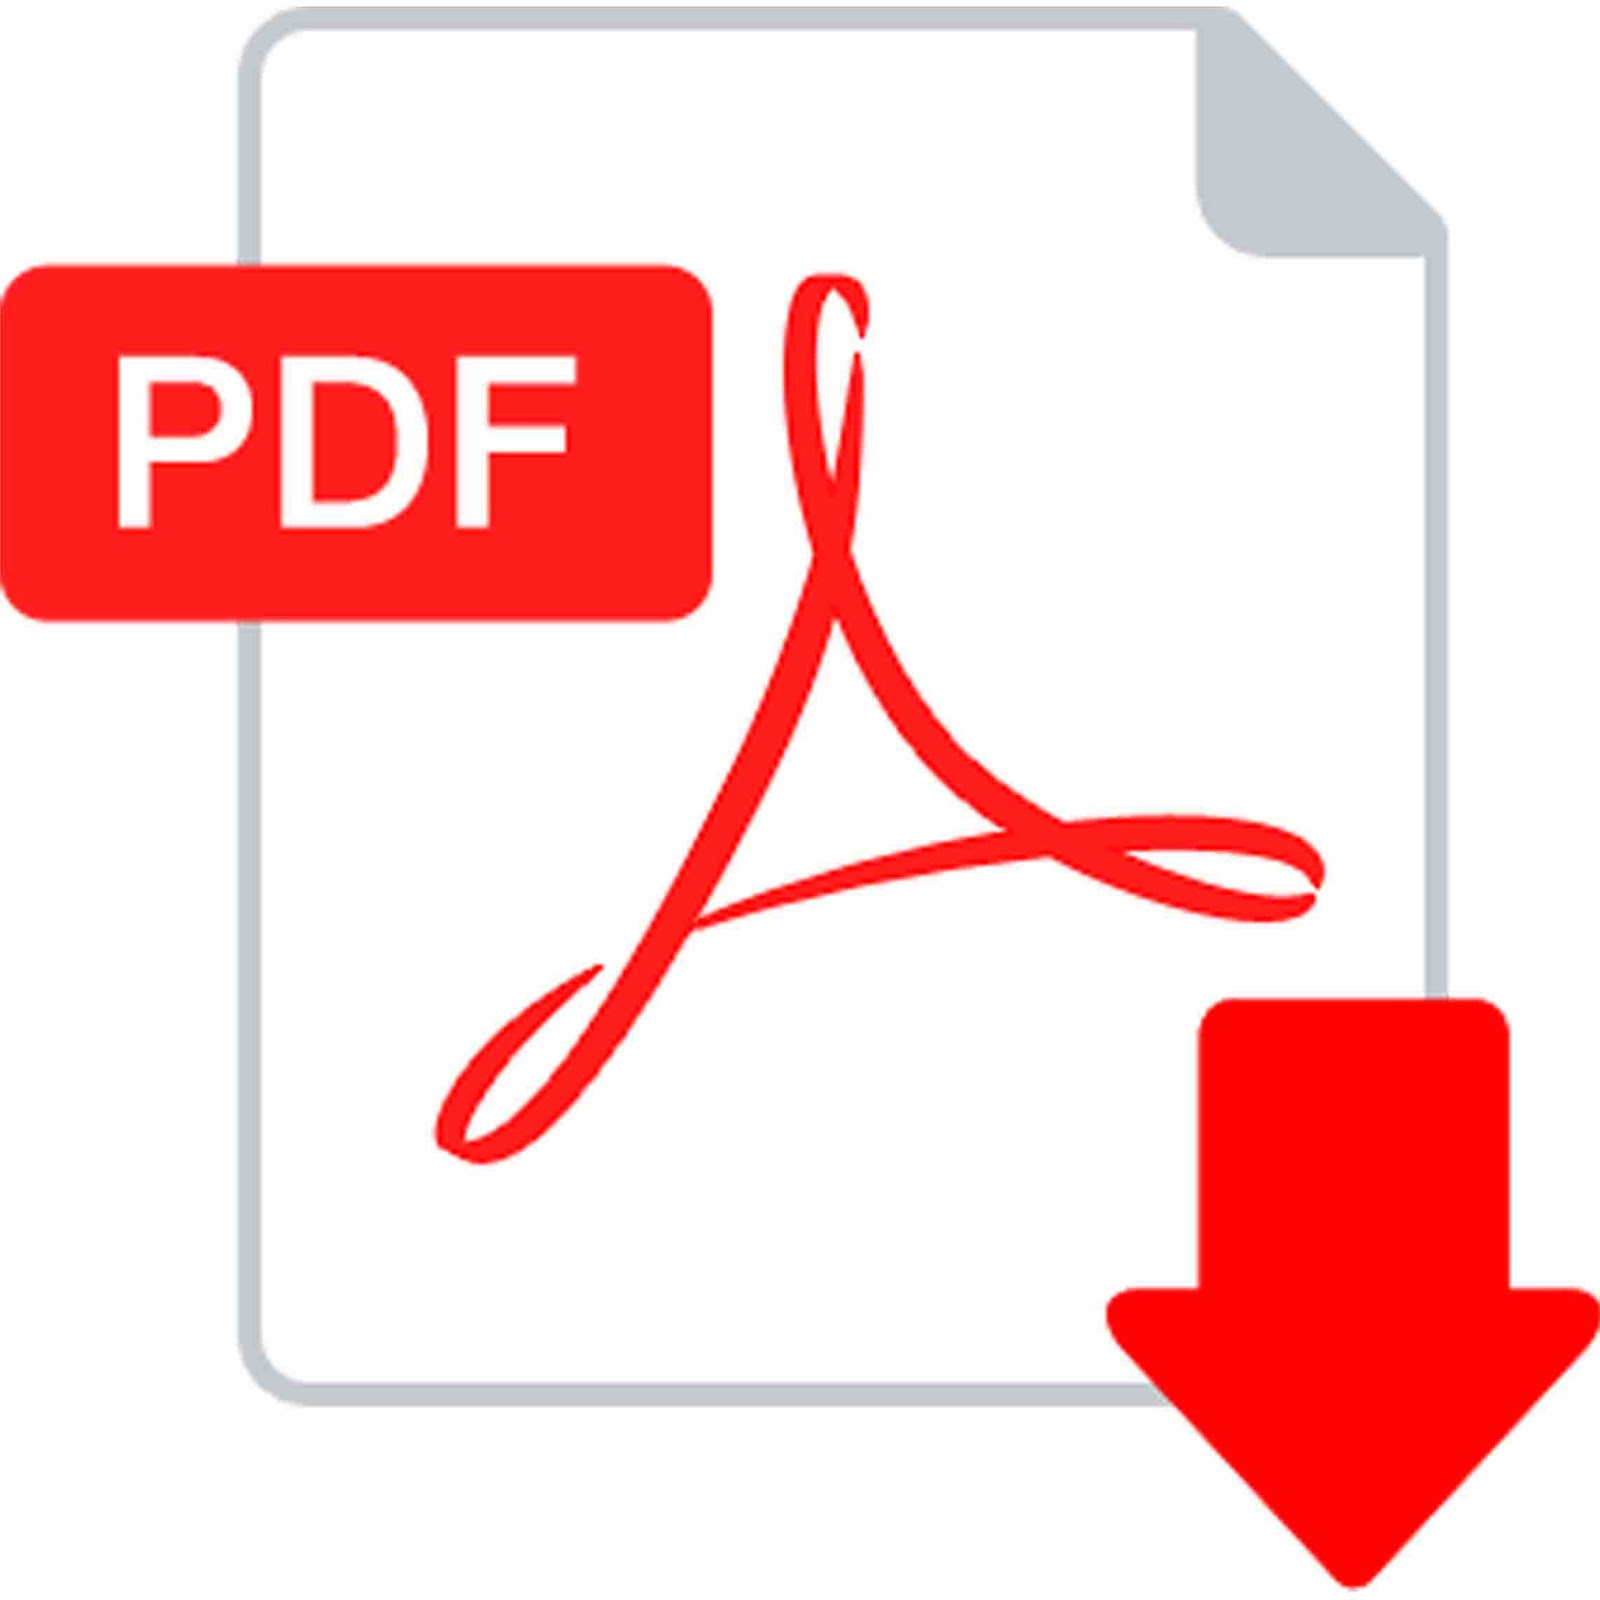 http://www.ou-zhelyu-voyvoda.com/files/2020/01/отчет-четвърто-тримесечие.pdf